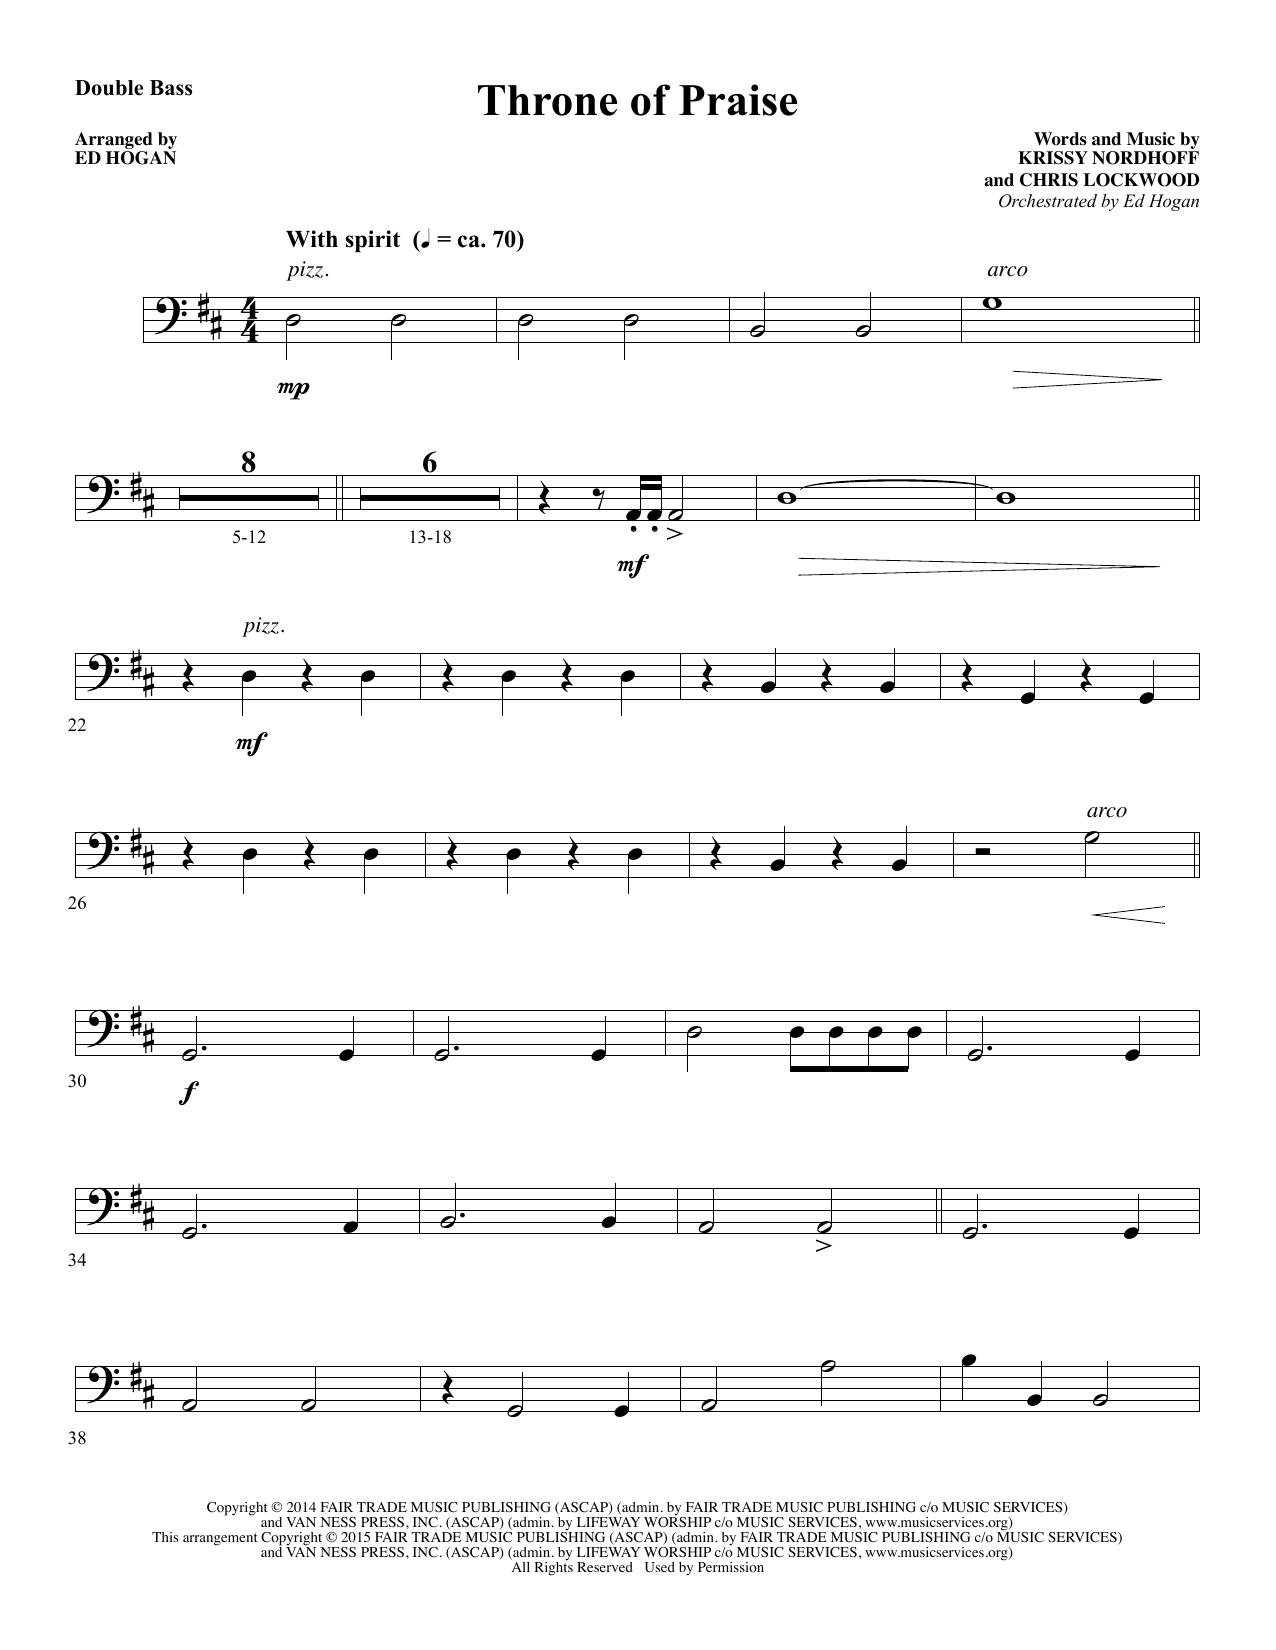 Throne of Praise - Double Bass sheet music